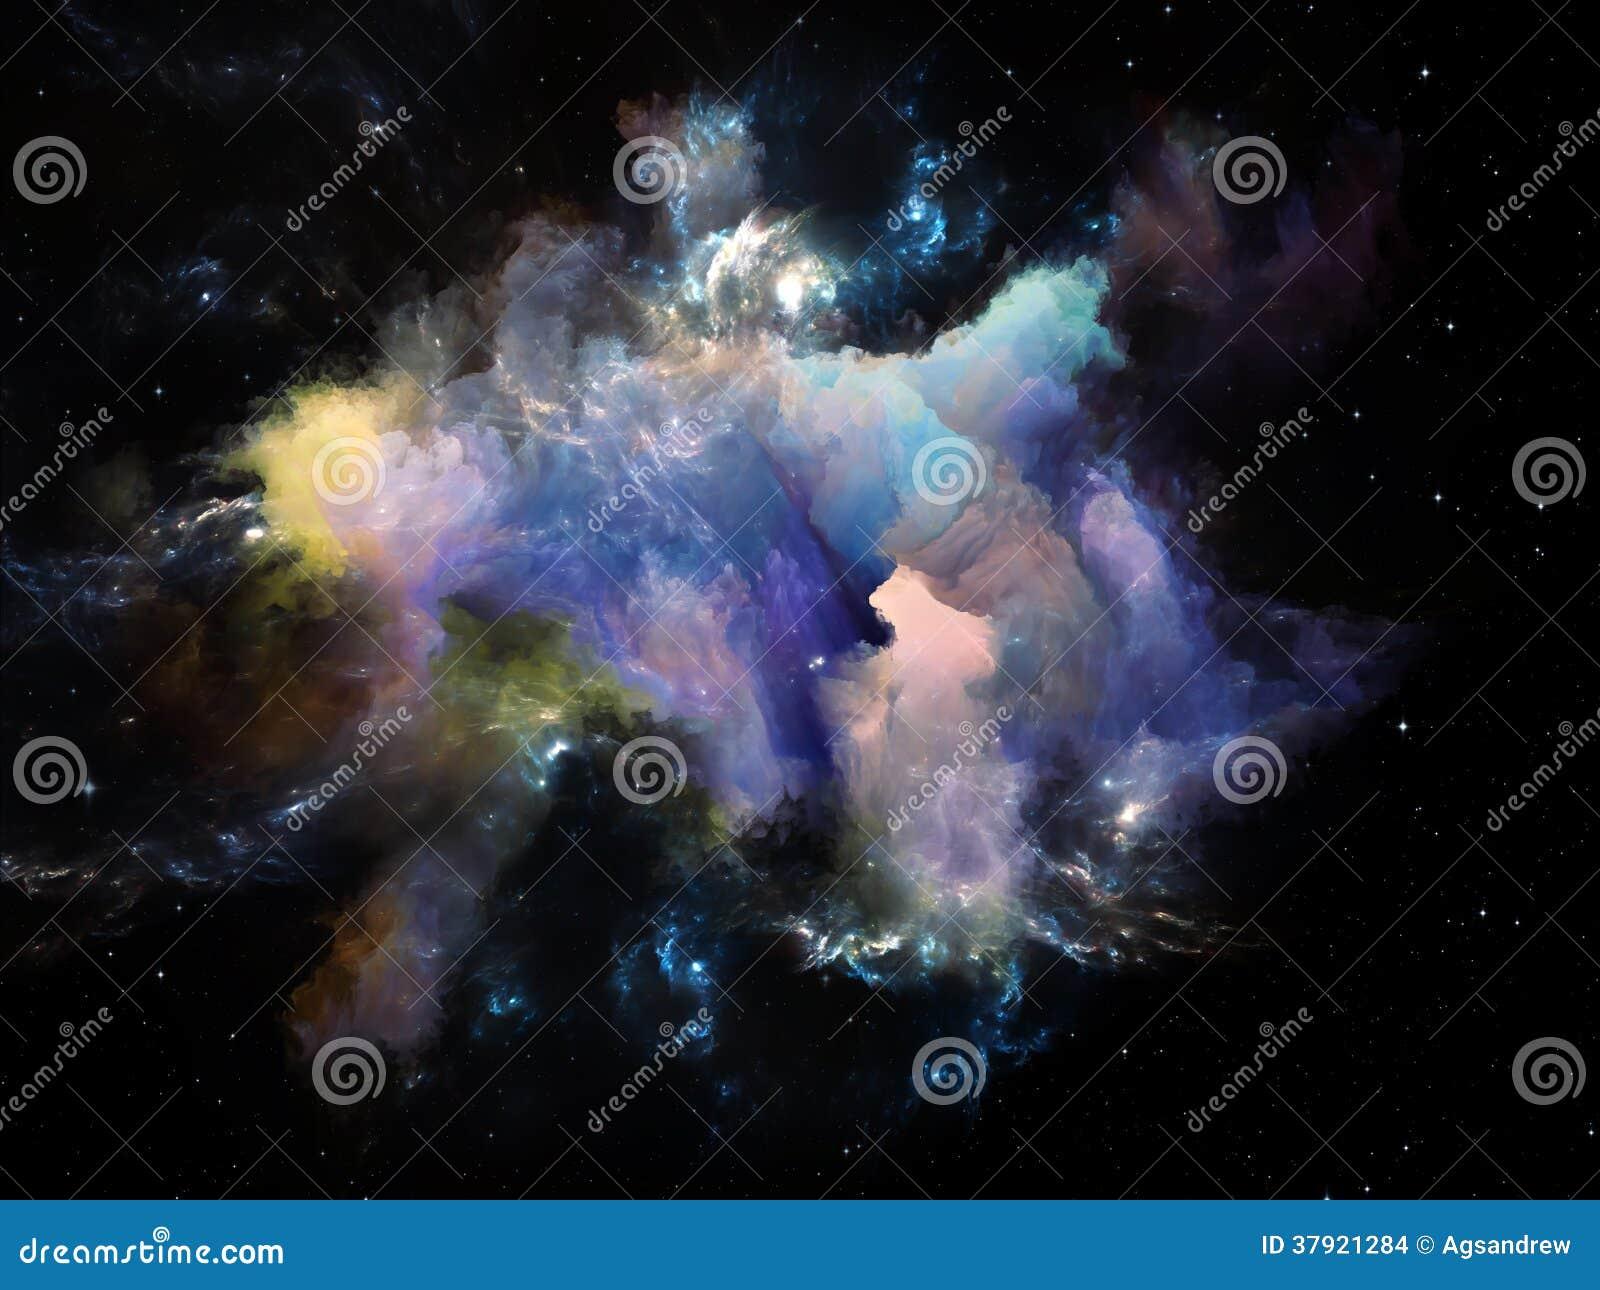 Cosmic Fantasy Fractal Blacklight: Cosmic Nebula Stock Images